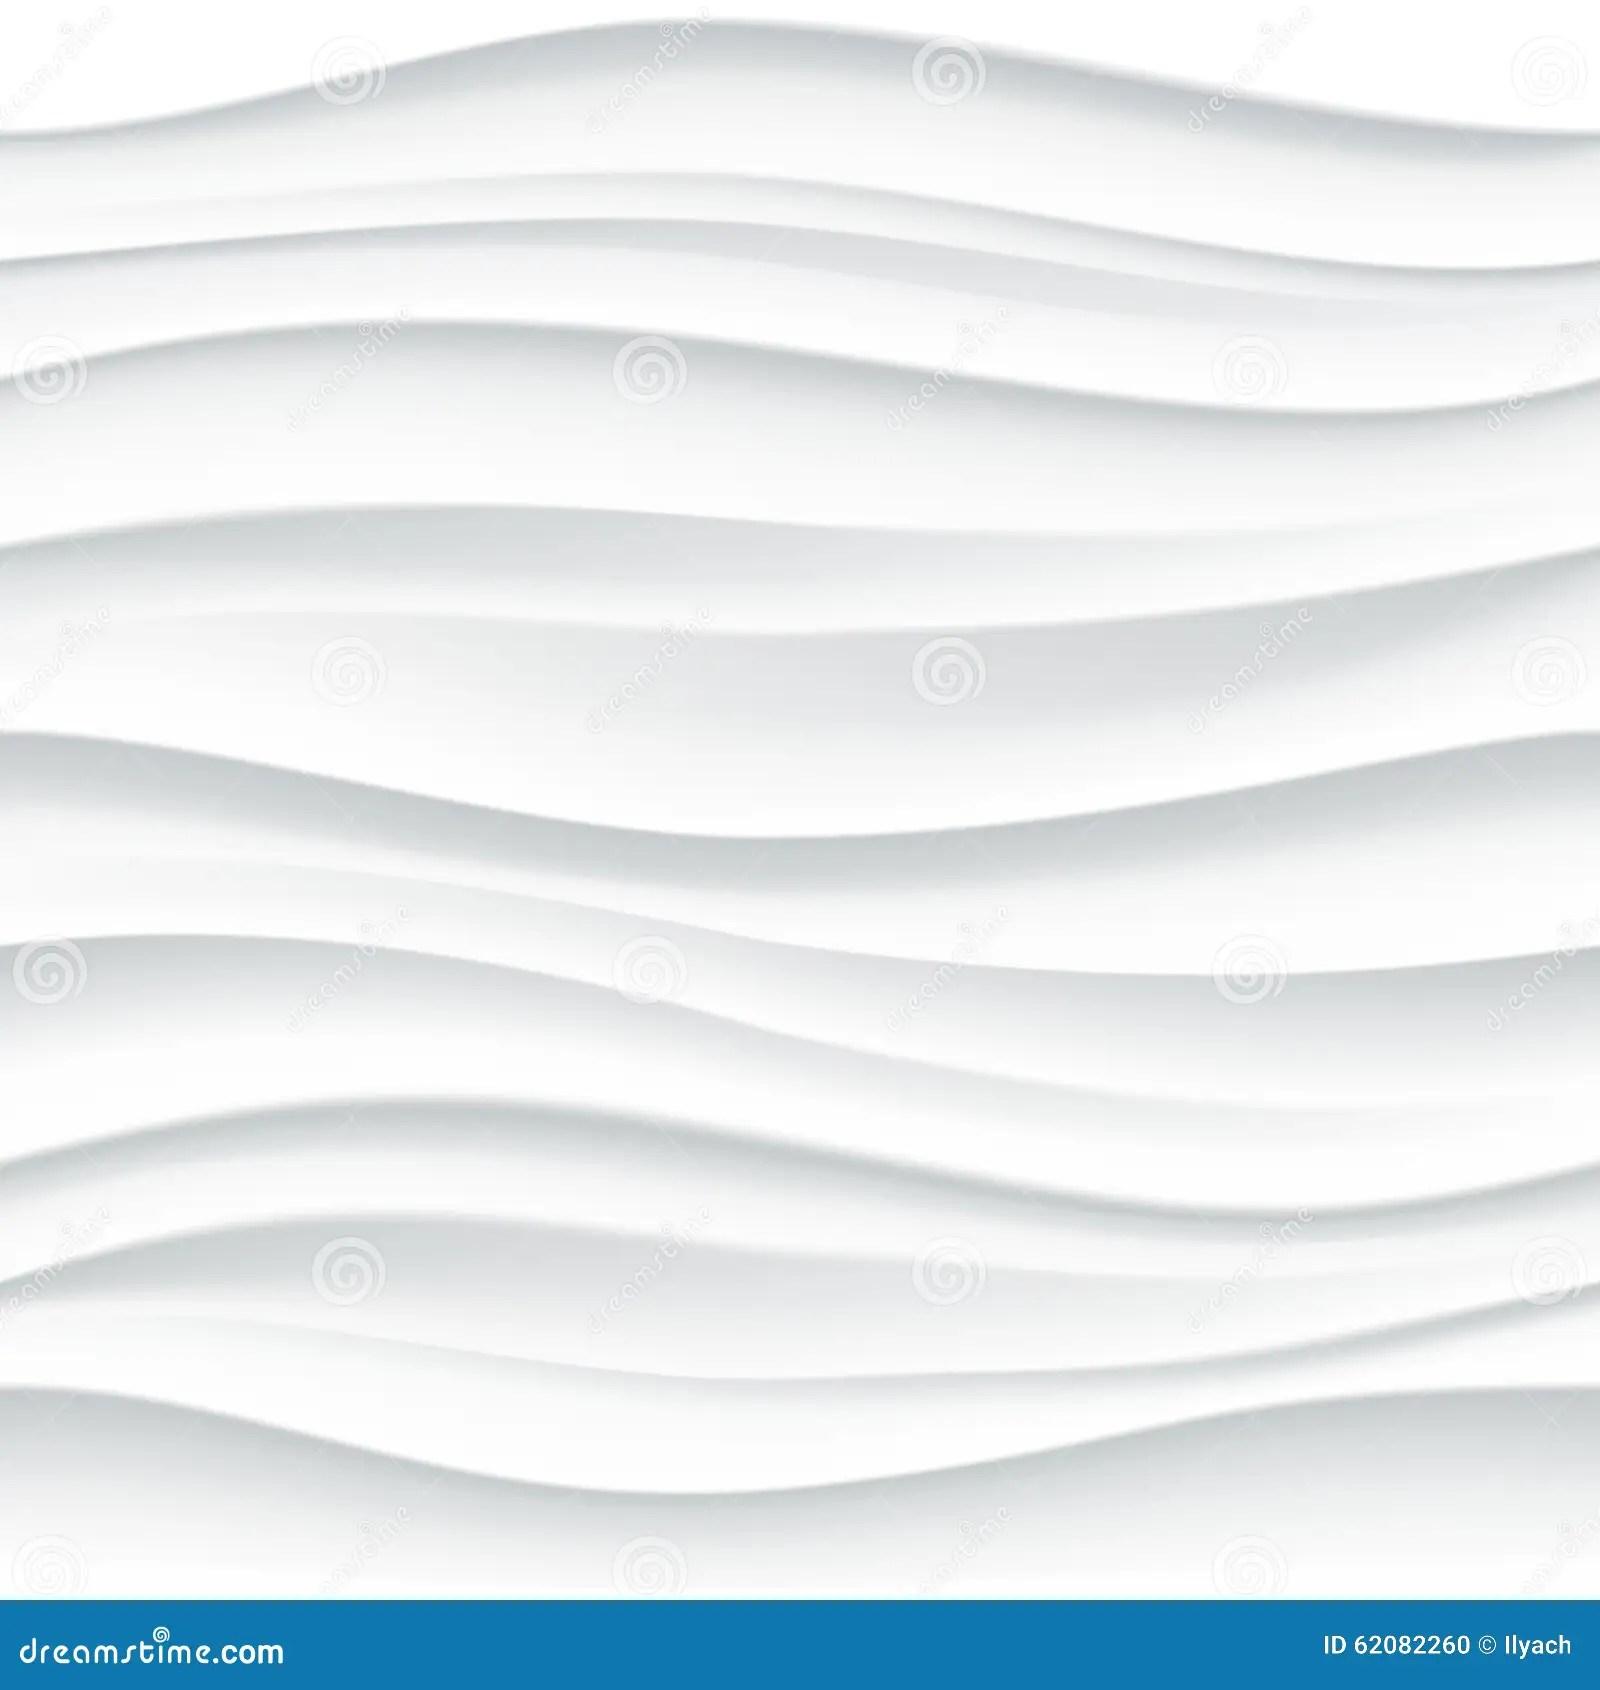 White Seamless Wavy Tile Textured Panel Stock Illustration  Image 62082260